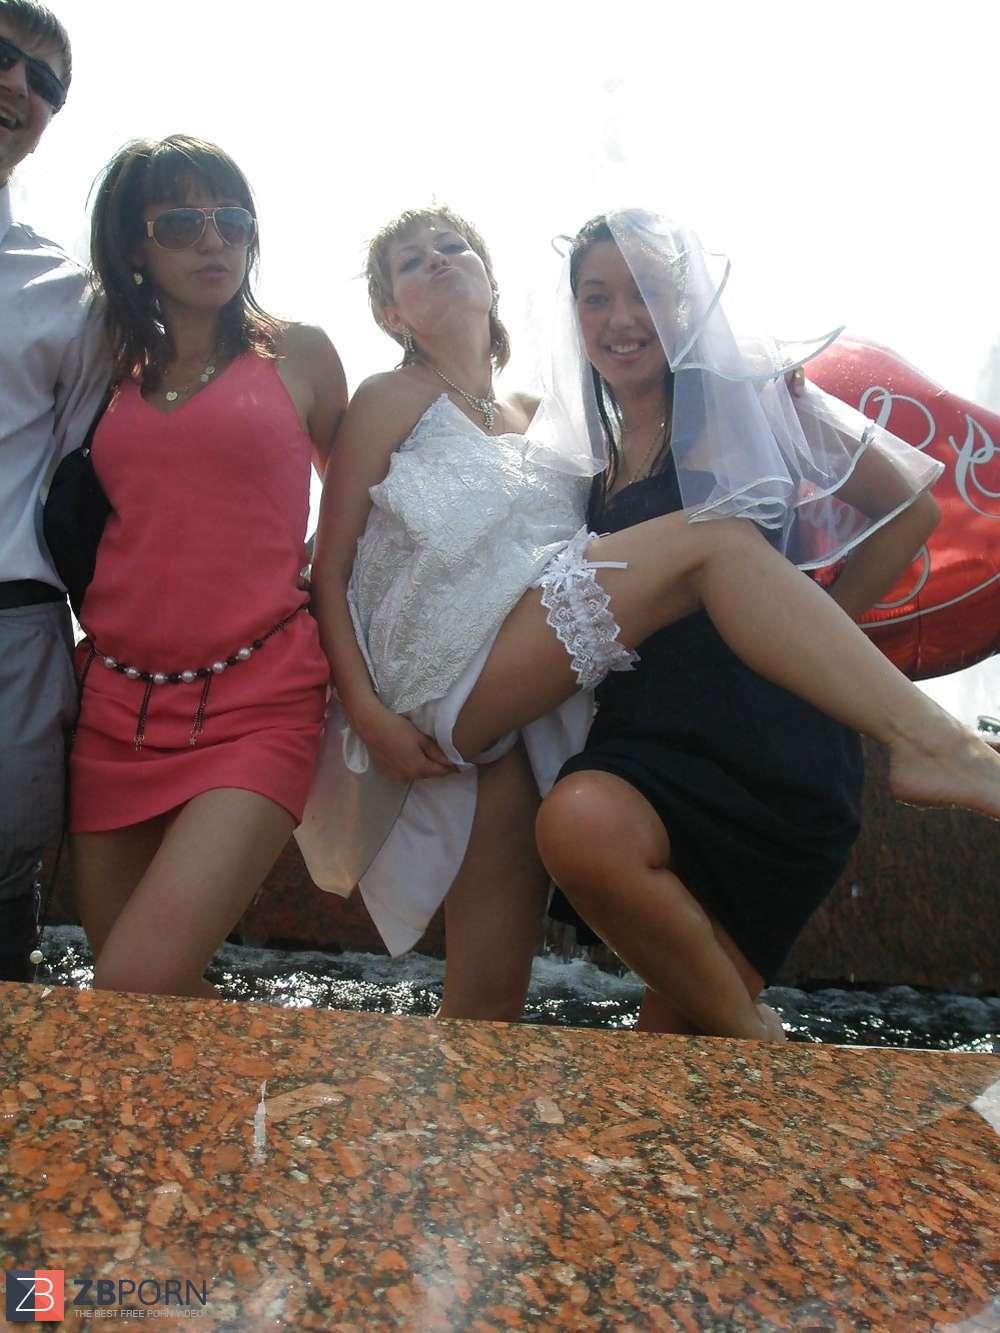 Admin recommends Jane fonda threesome details